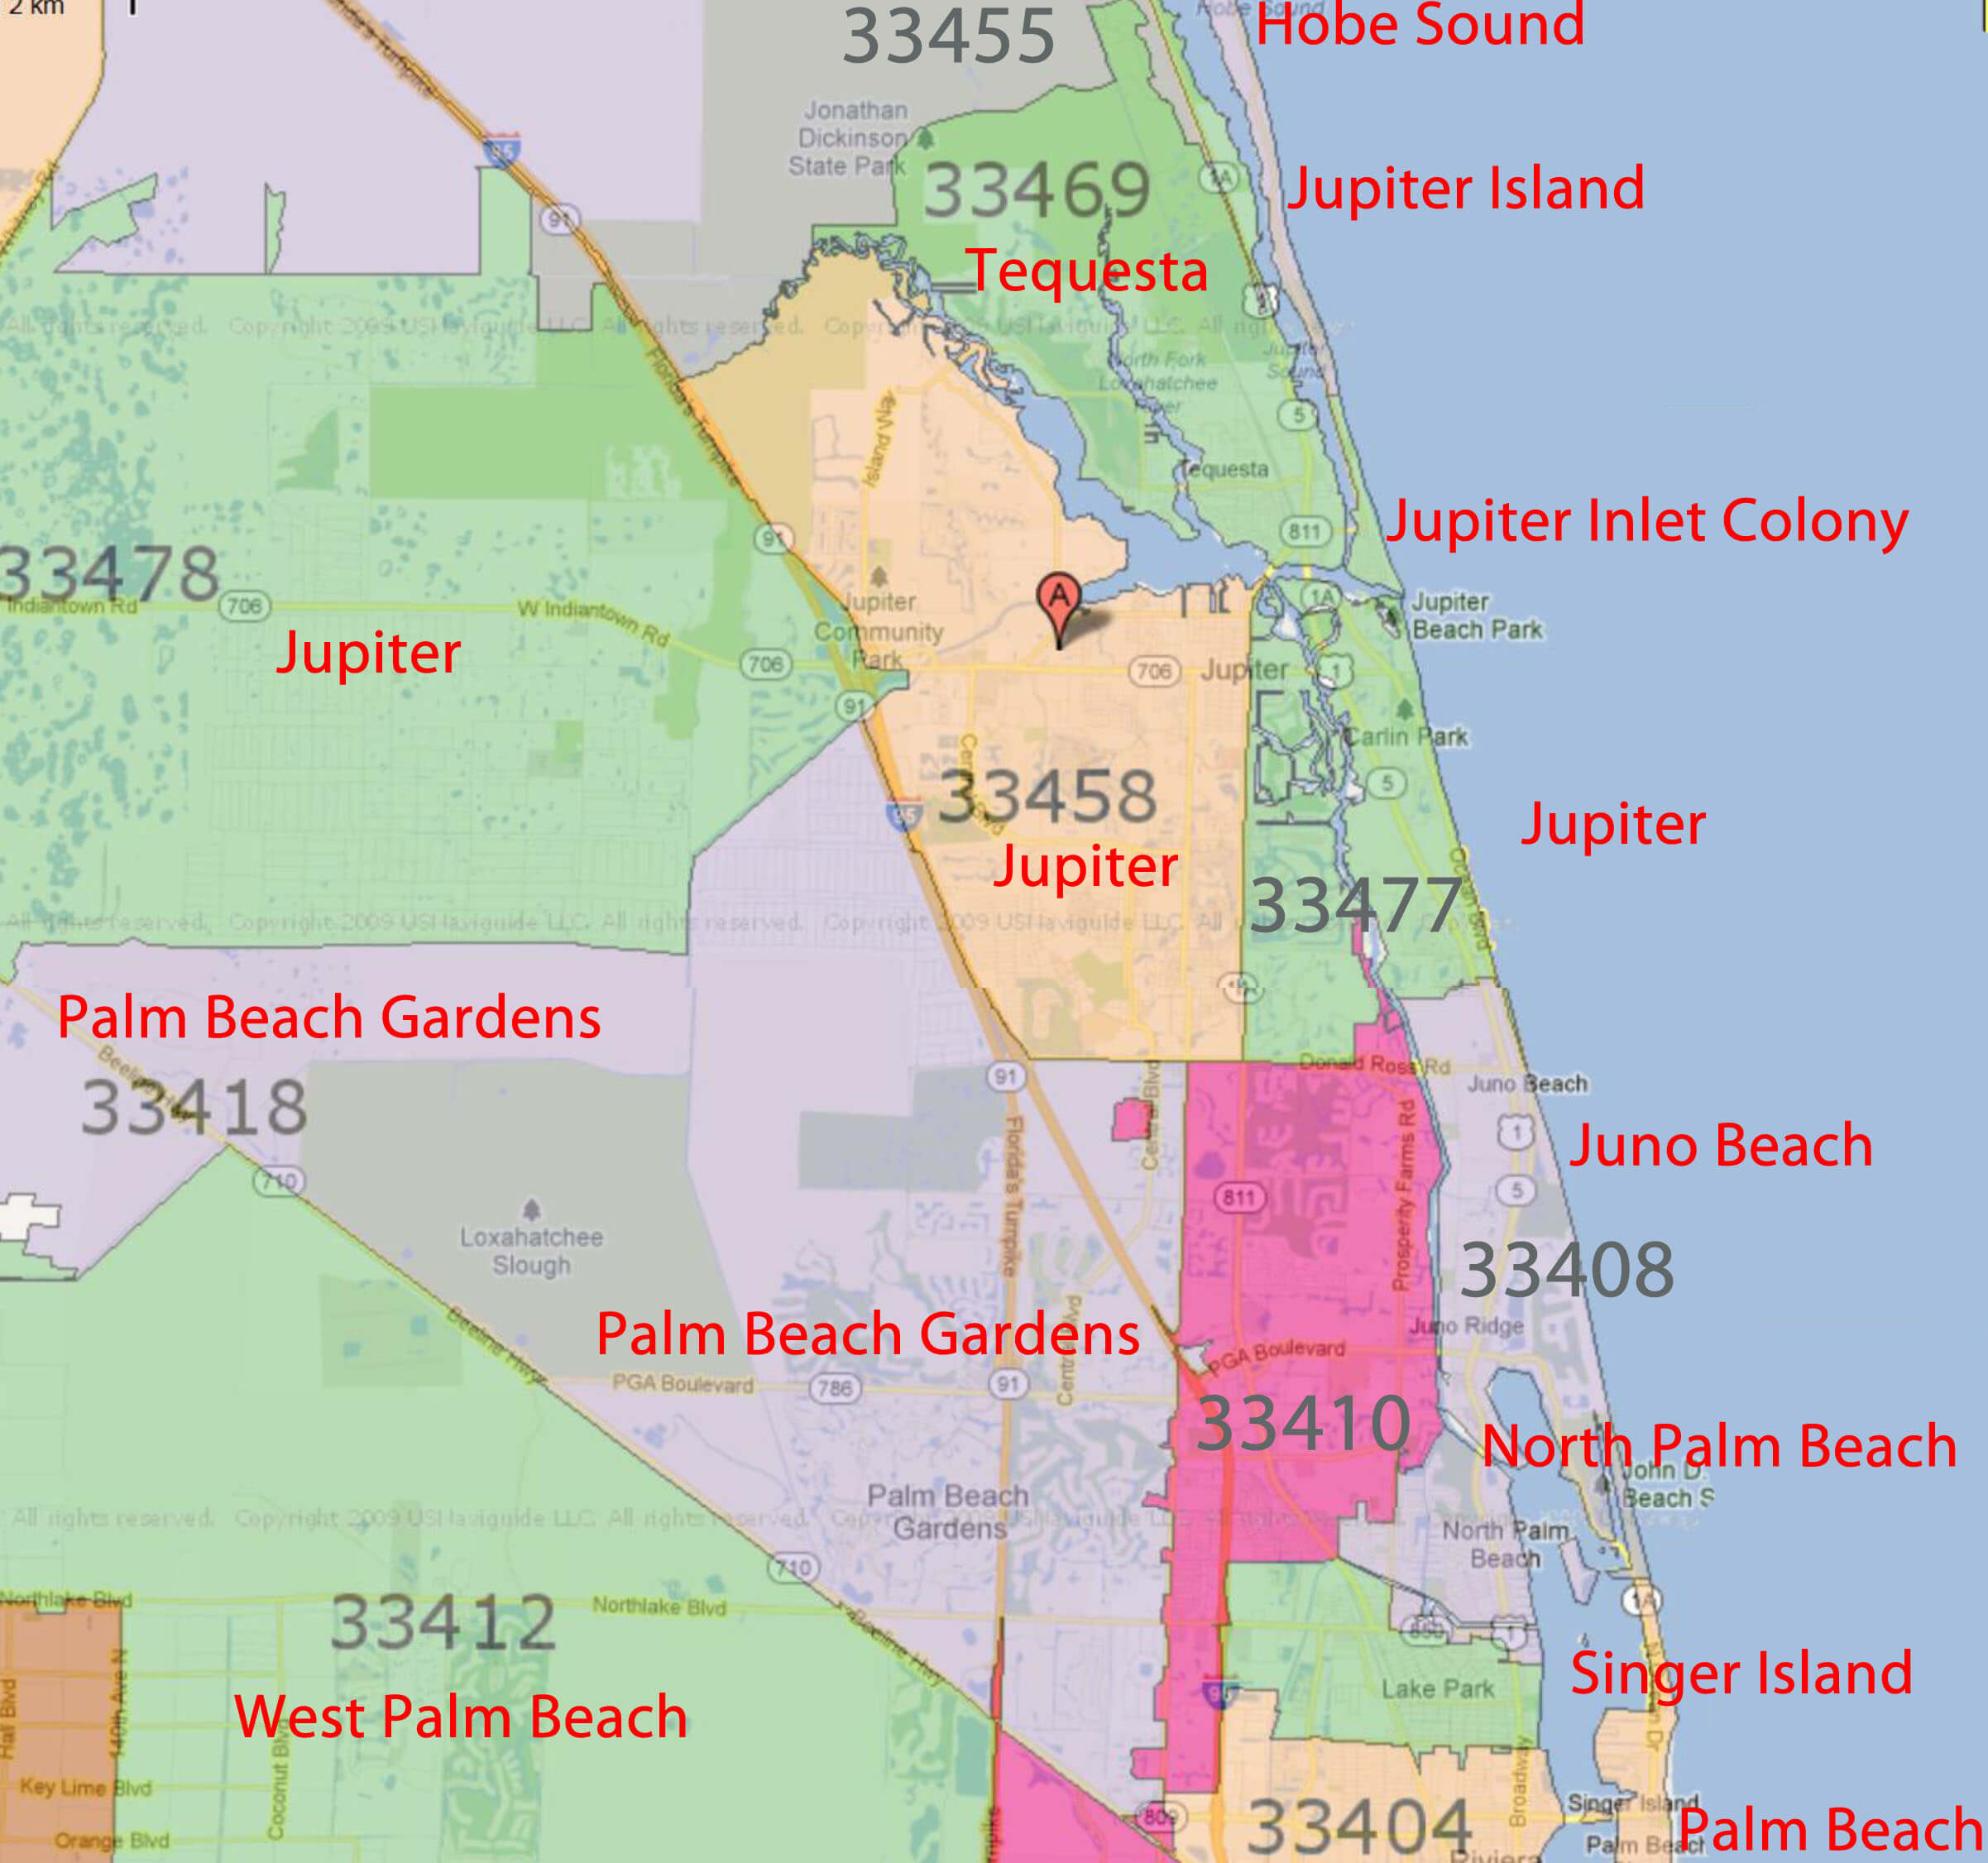 Palm Beach Gardens, Jupiter Florida Real Estatezip Code - Jupiter Inlet Florida Map